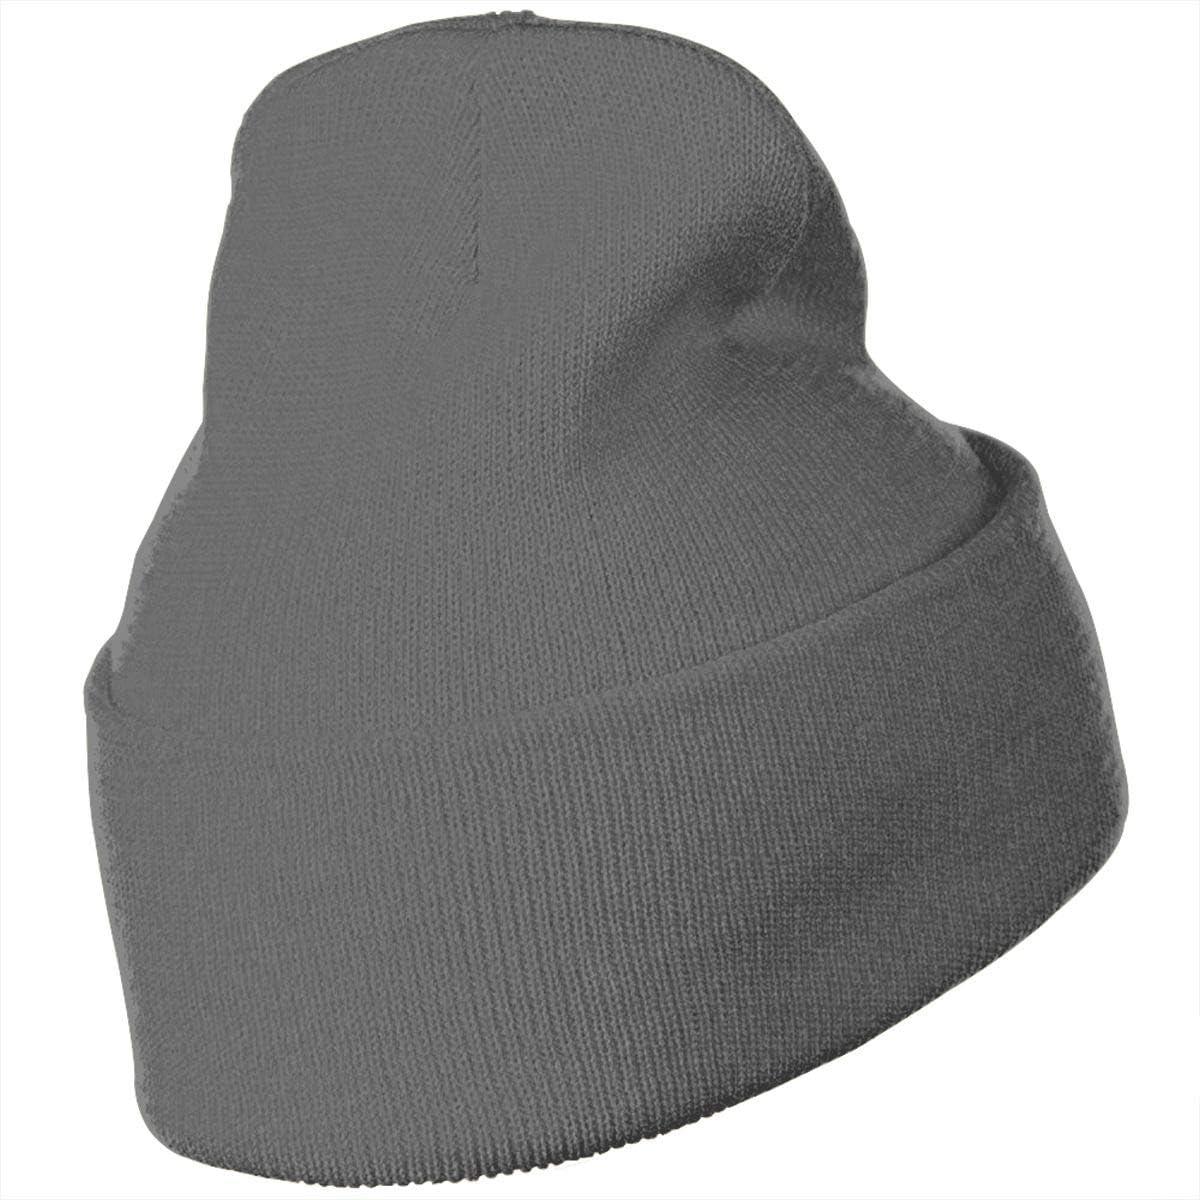 QZqDQ May Unisex Fashion Knitted Hat Luxury Hip-Hop Cap